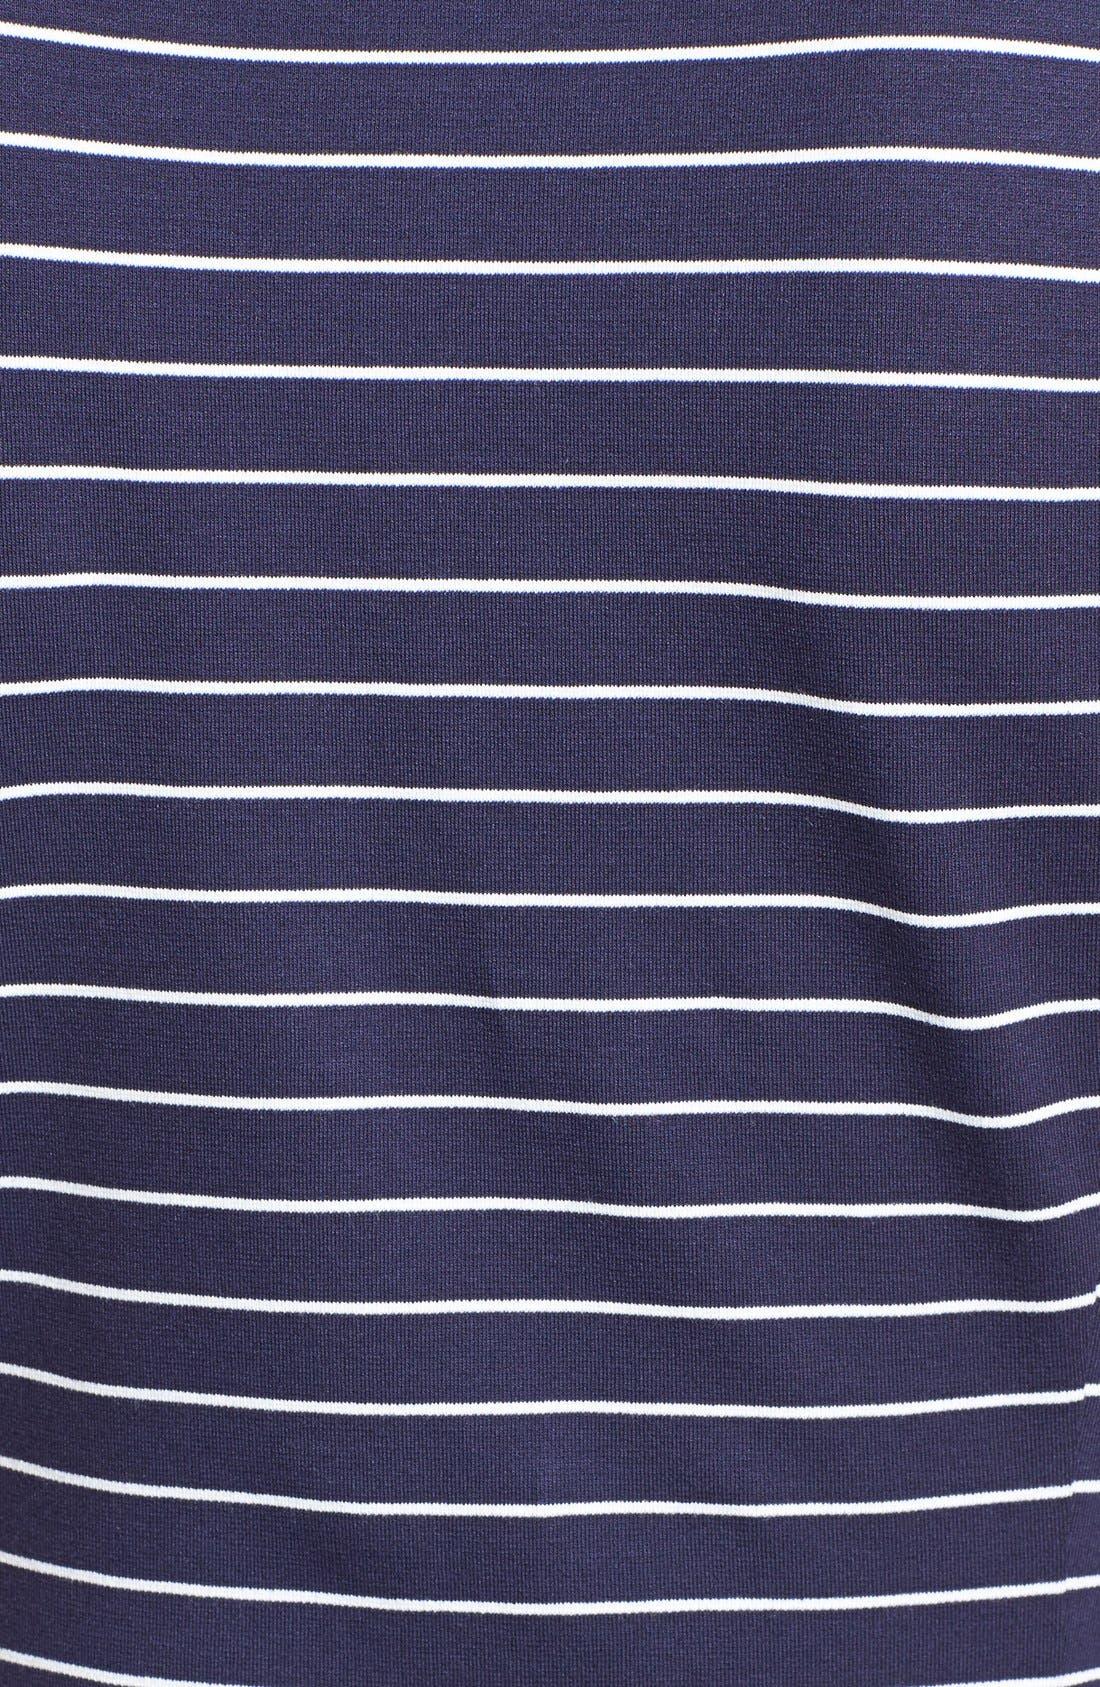 Alternate Image 3  - Theory 'Sayidres' Knit Fit & Flare Dress